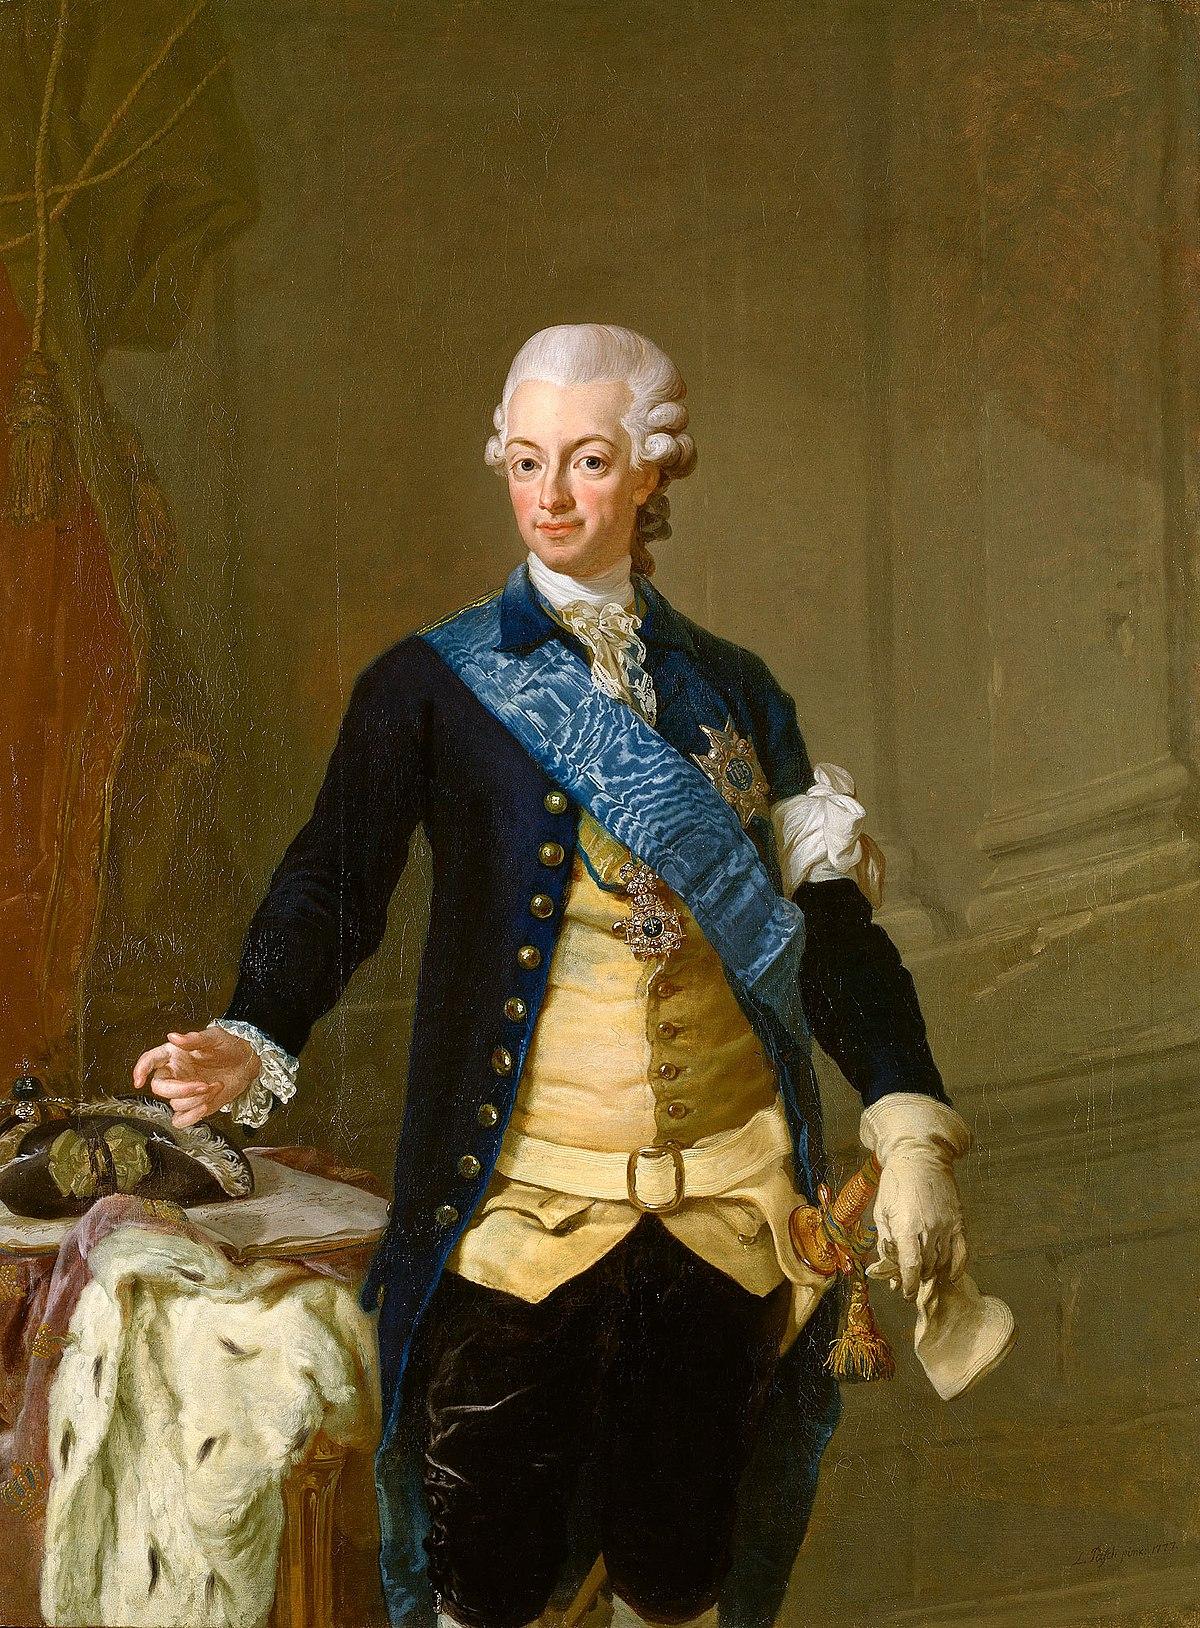 Fichier:Gustav III Sweden.jpg — Wikipédia